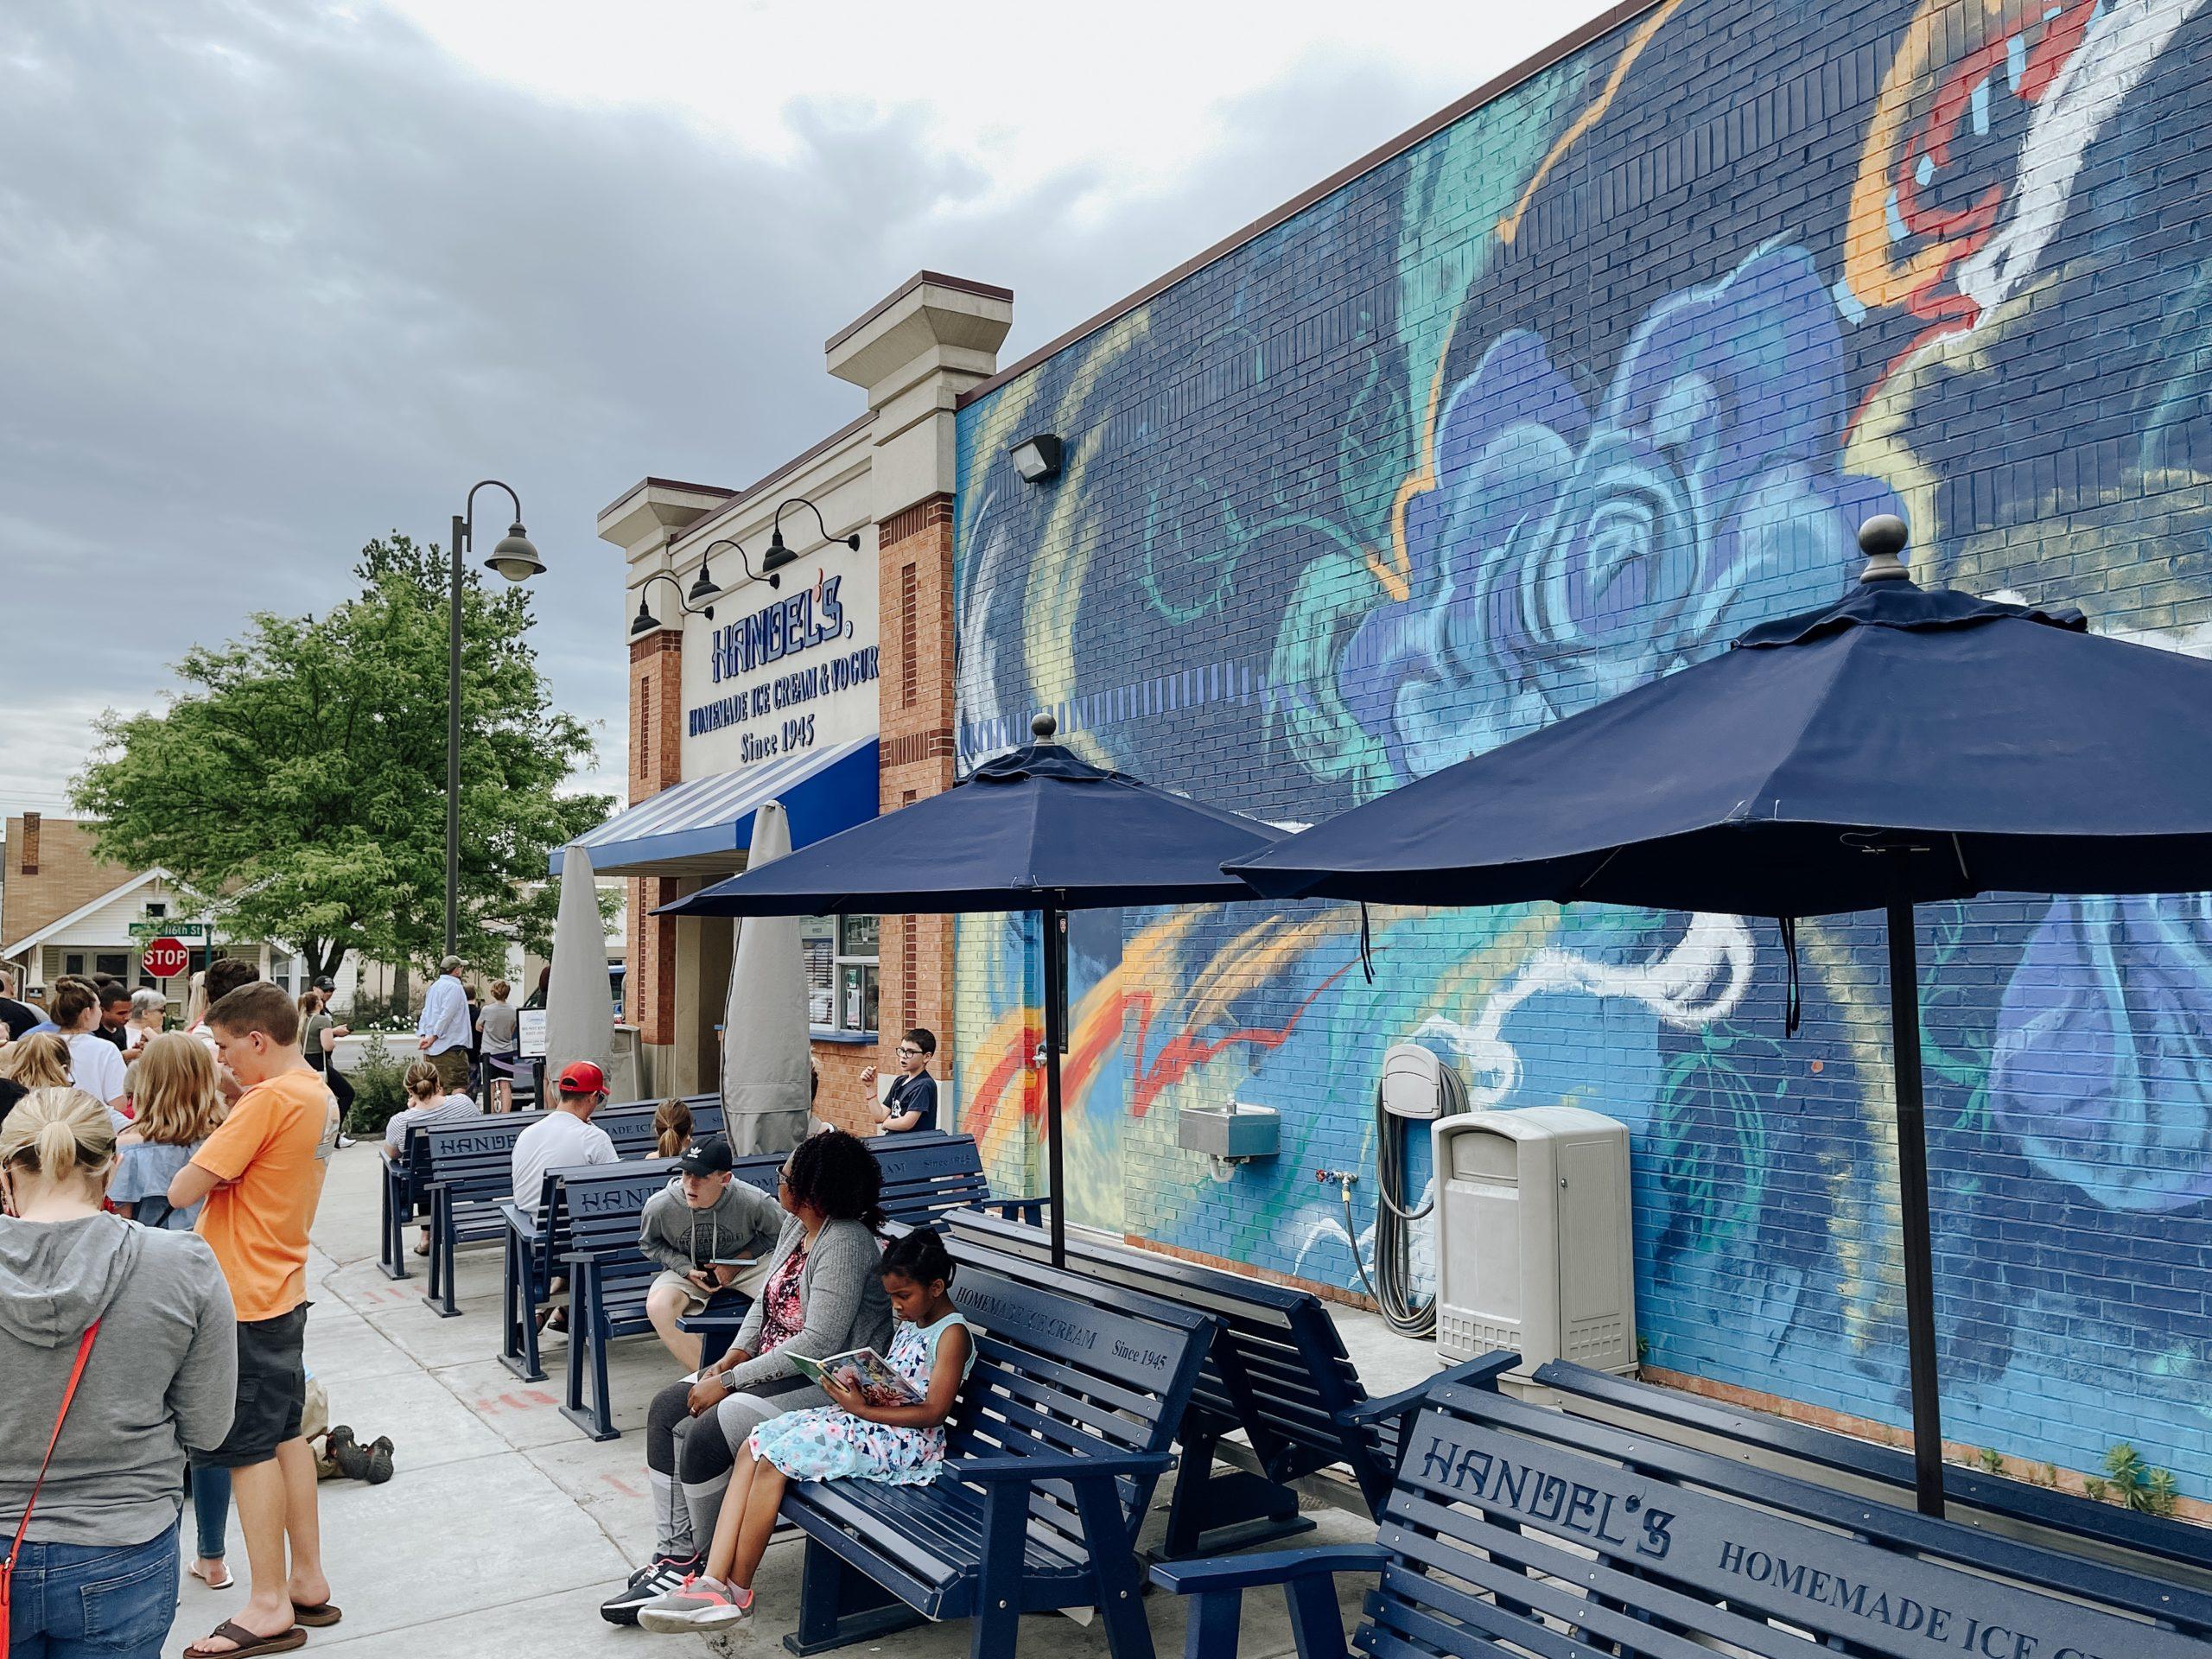 handel's ice cream mural